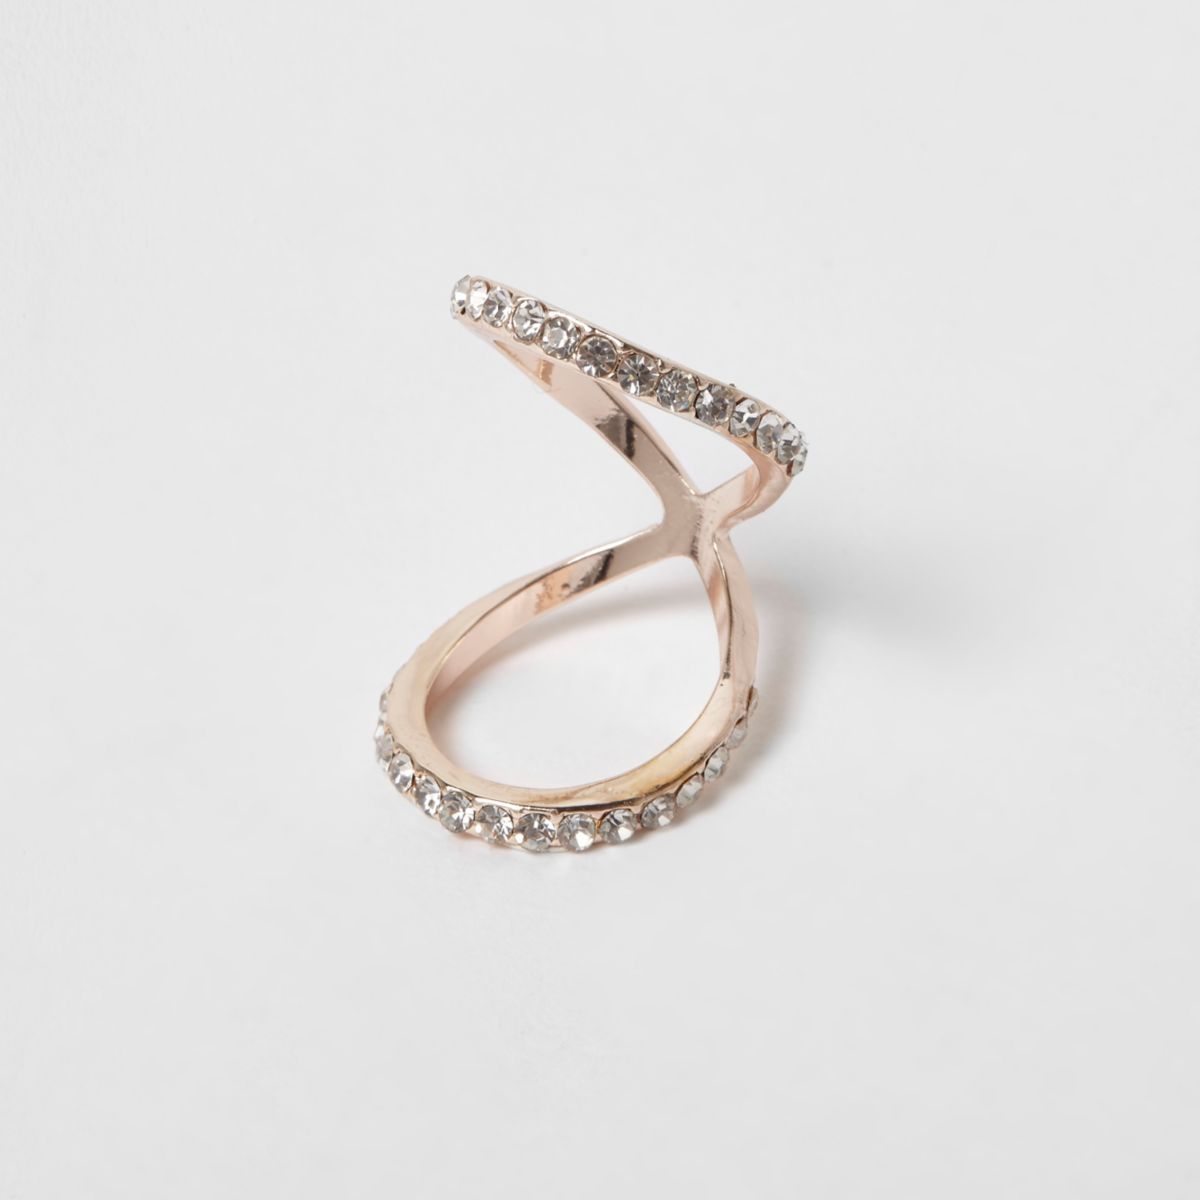 Rose gold tone rhinestone encusted knuckle ring